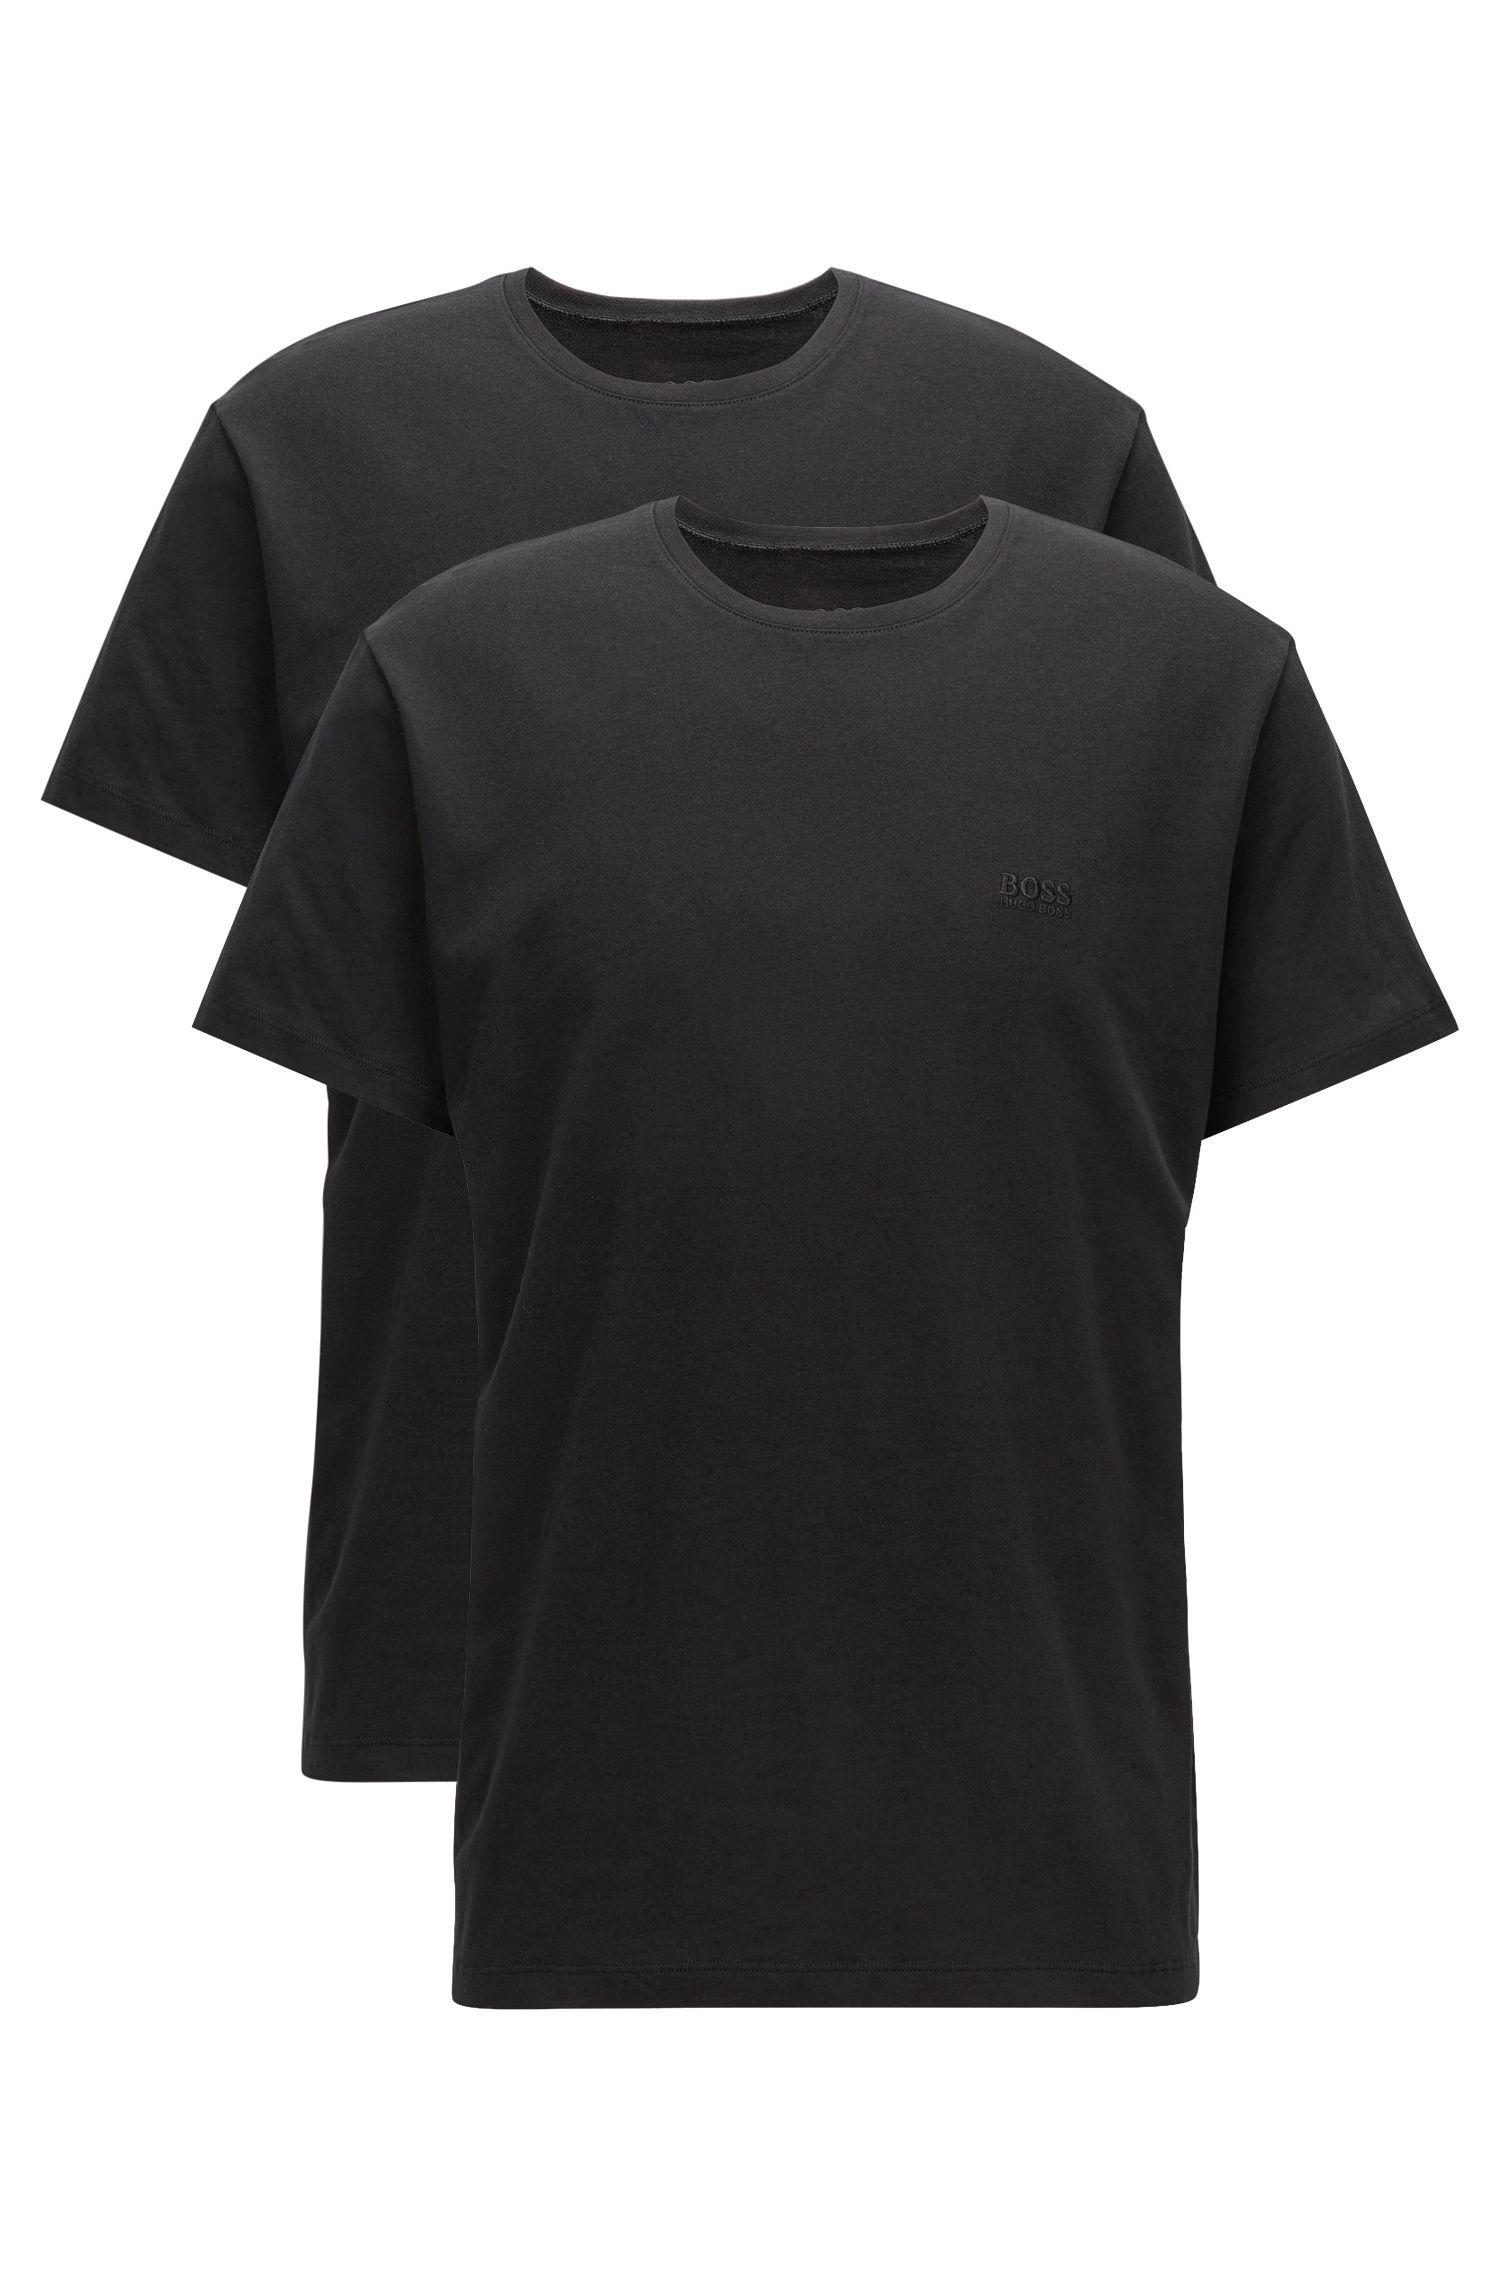 Paquete de dos camisetas relaxed fit en algodón con cuello redondo